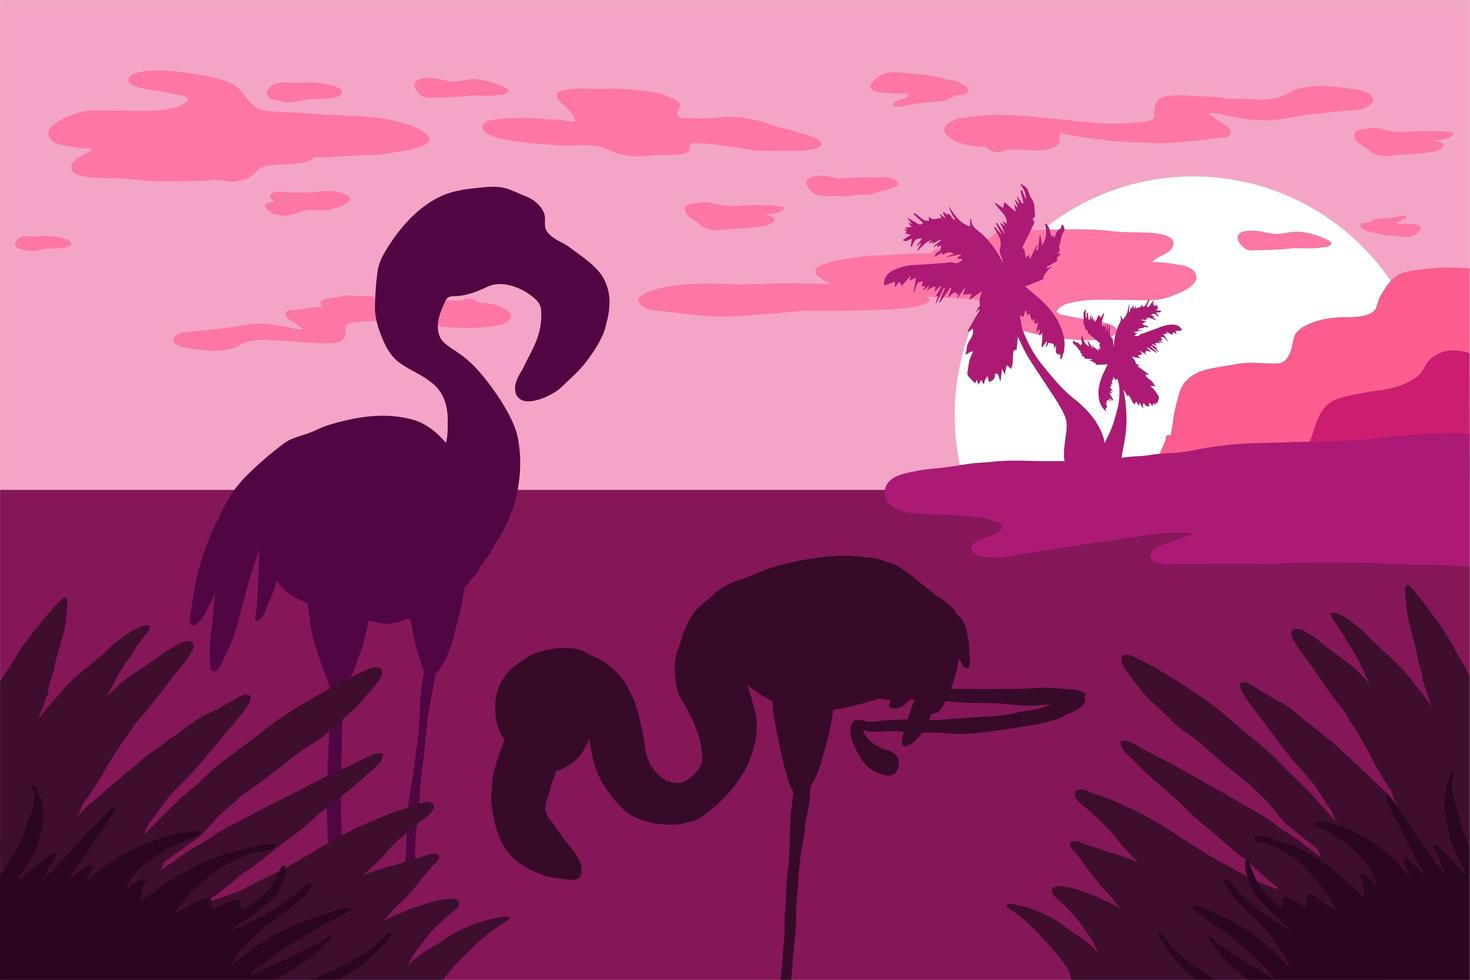 Landschaft mit flacher Vektorillustration der Flamingosilhouette vektor